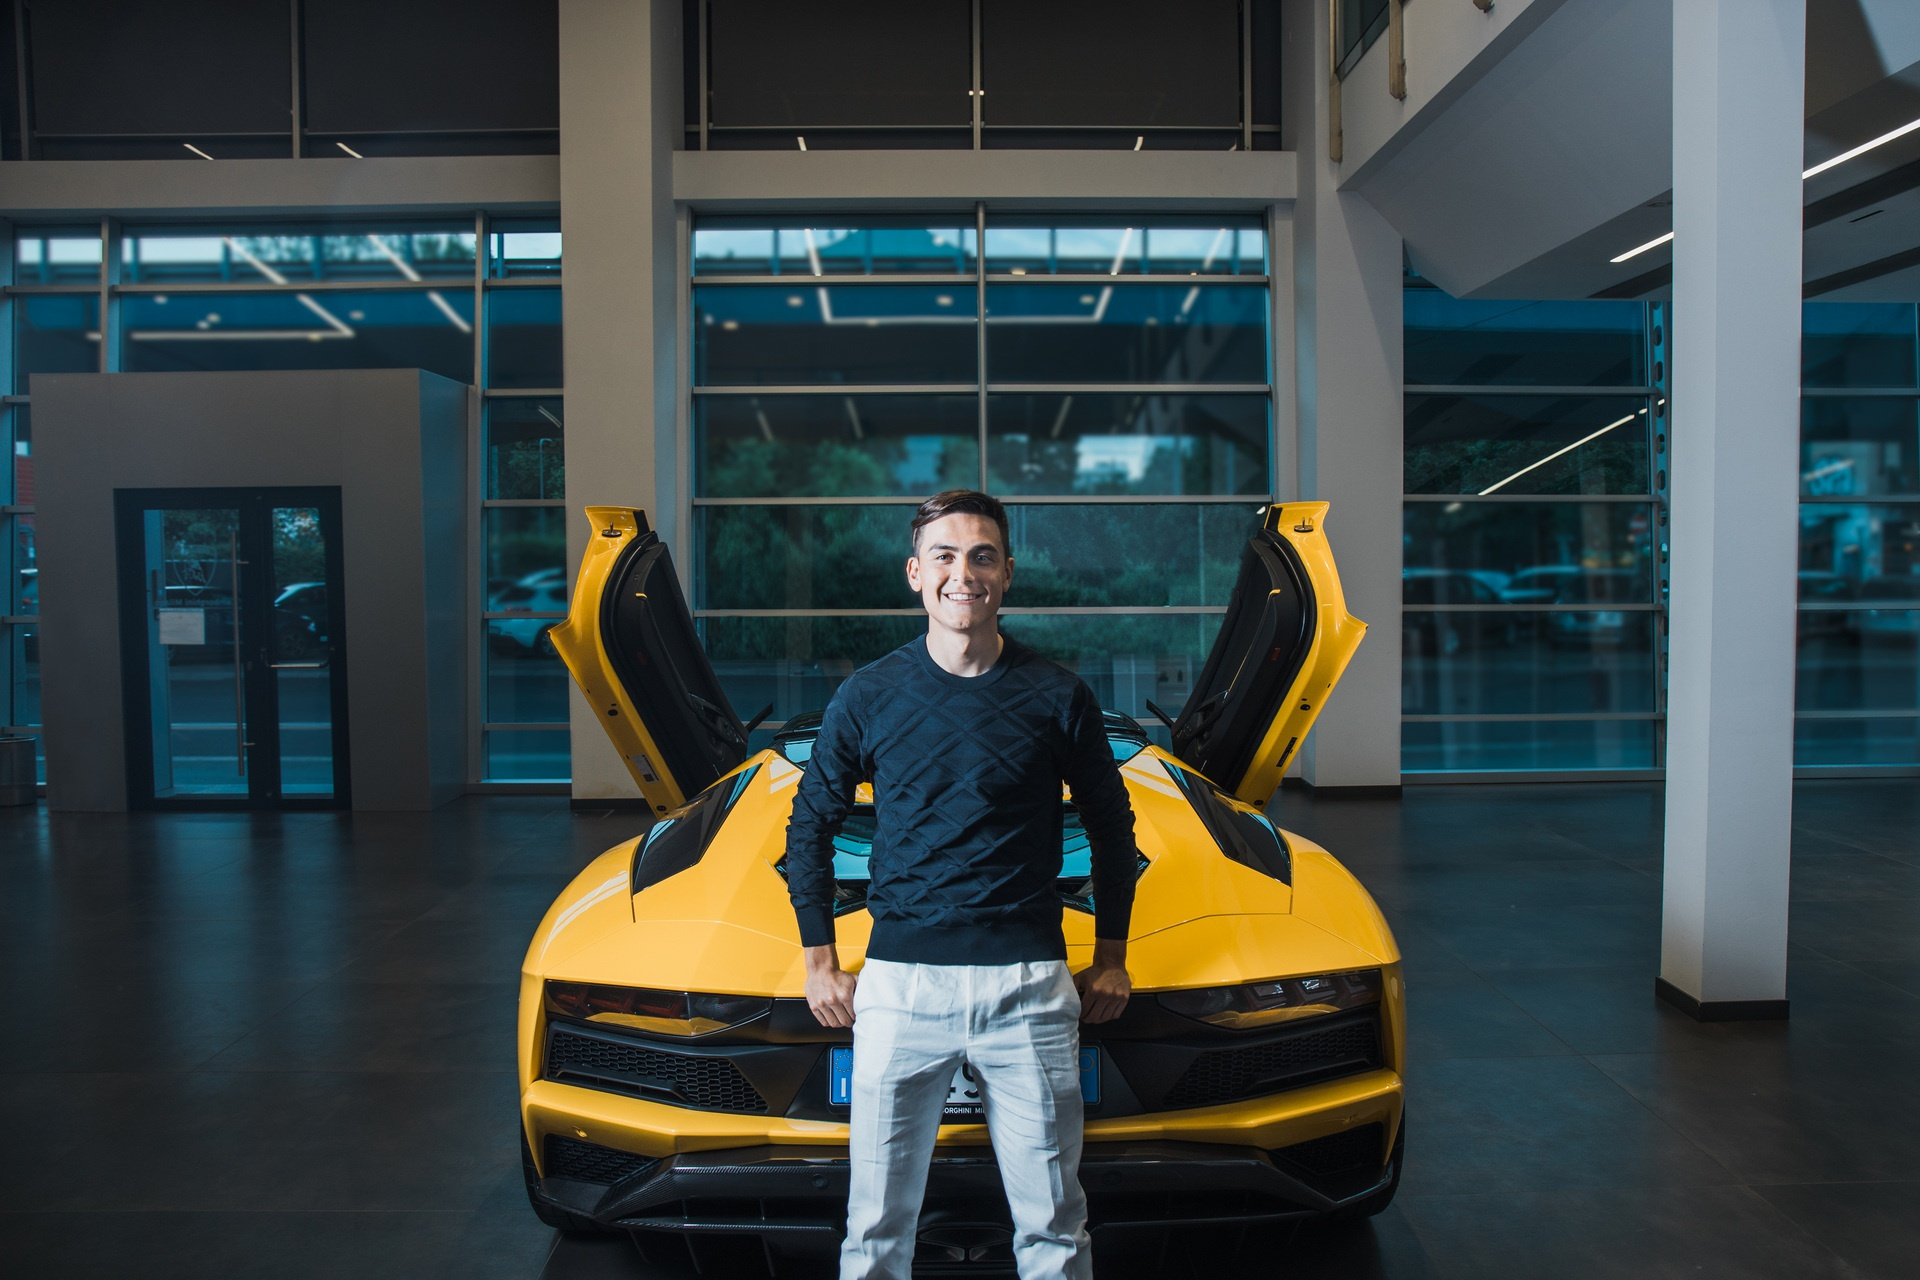 Chi tiết siêu xe Lamborghini Aventador S Roadster của Paulo Dybala - Ảnh 8.